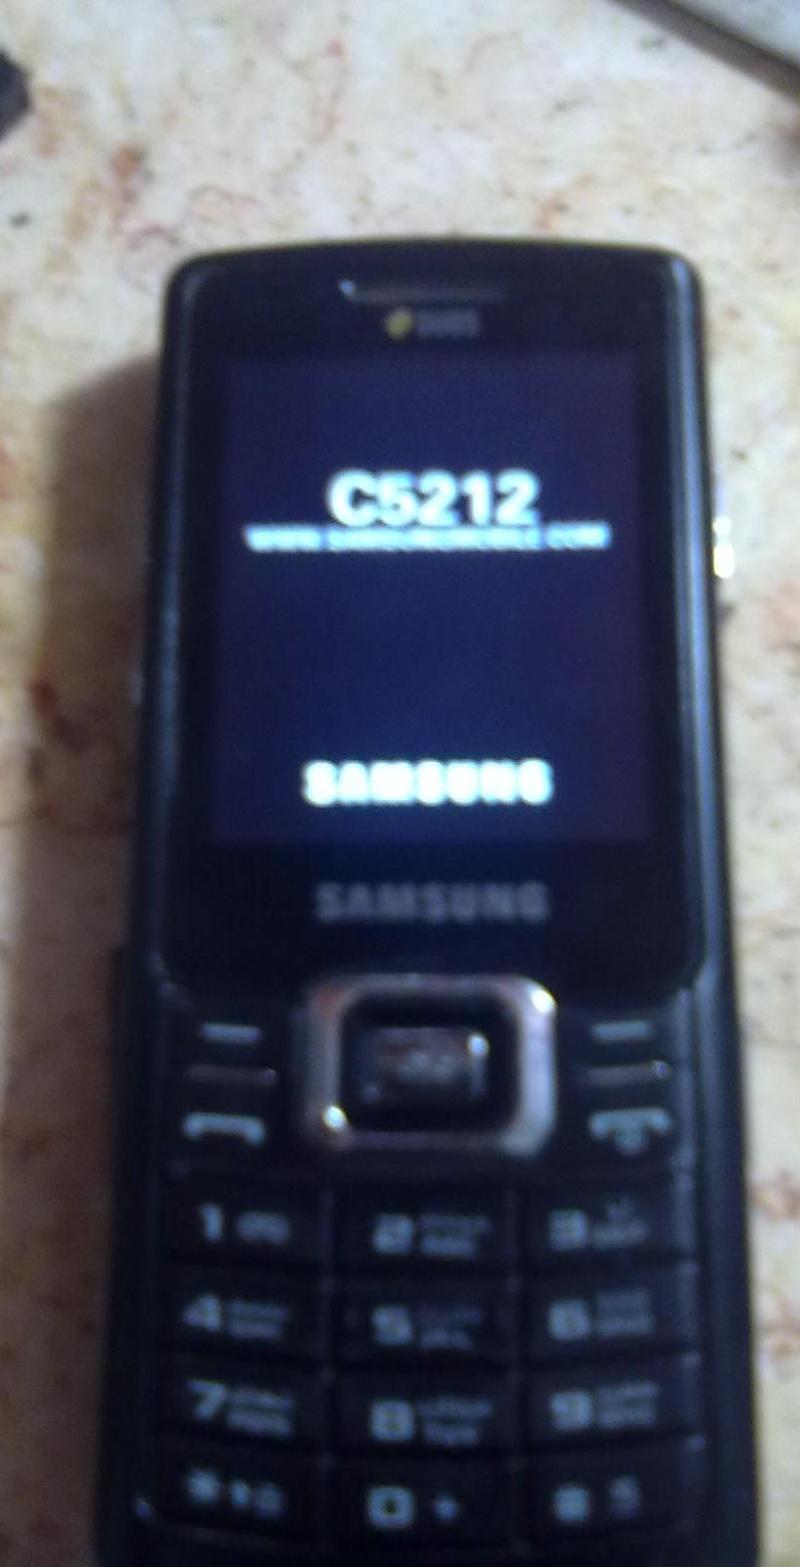 ����� �� ���� c5212 ������